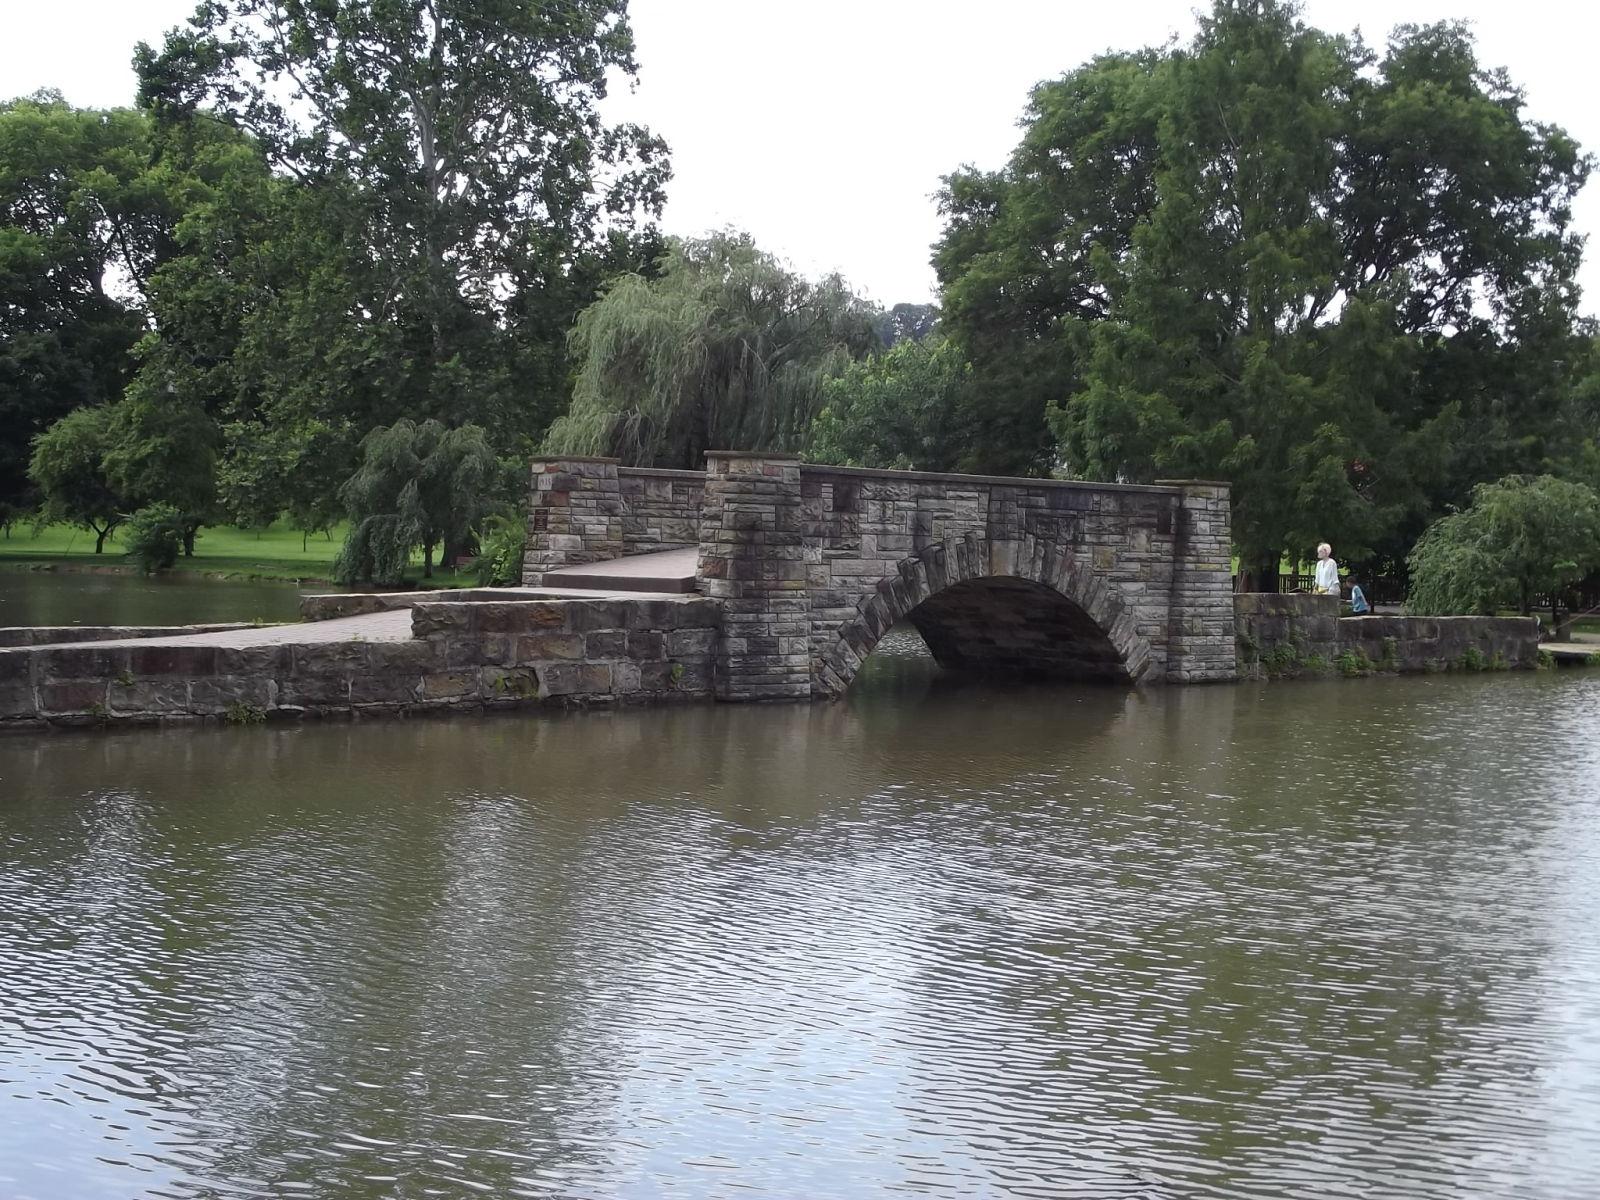 stone bridge over water with surrounding trees